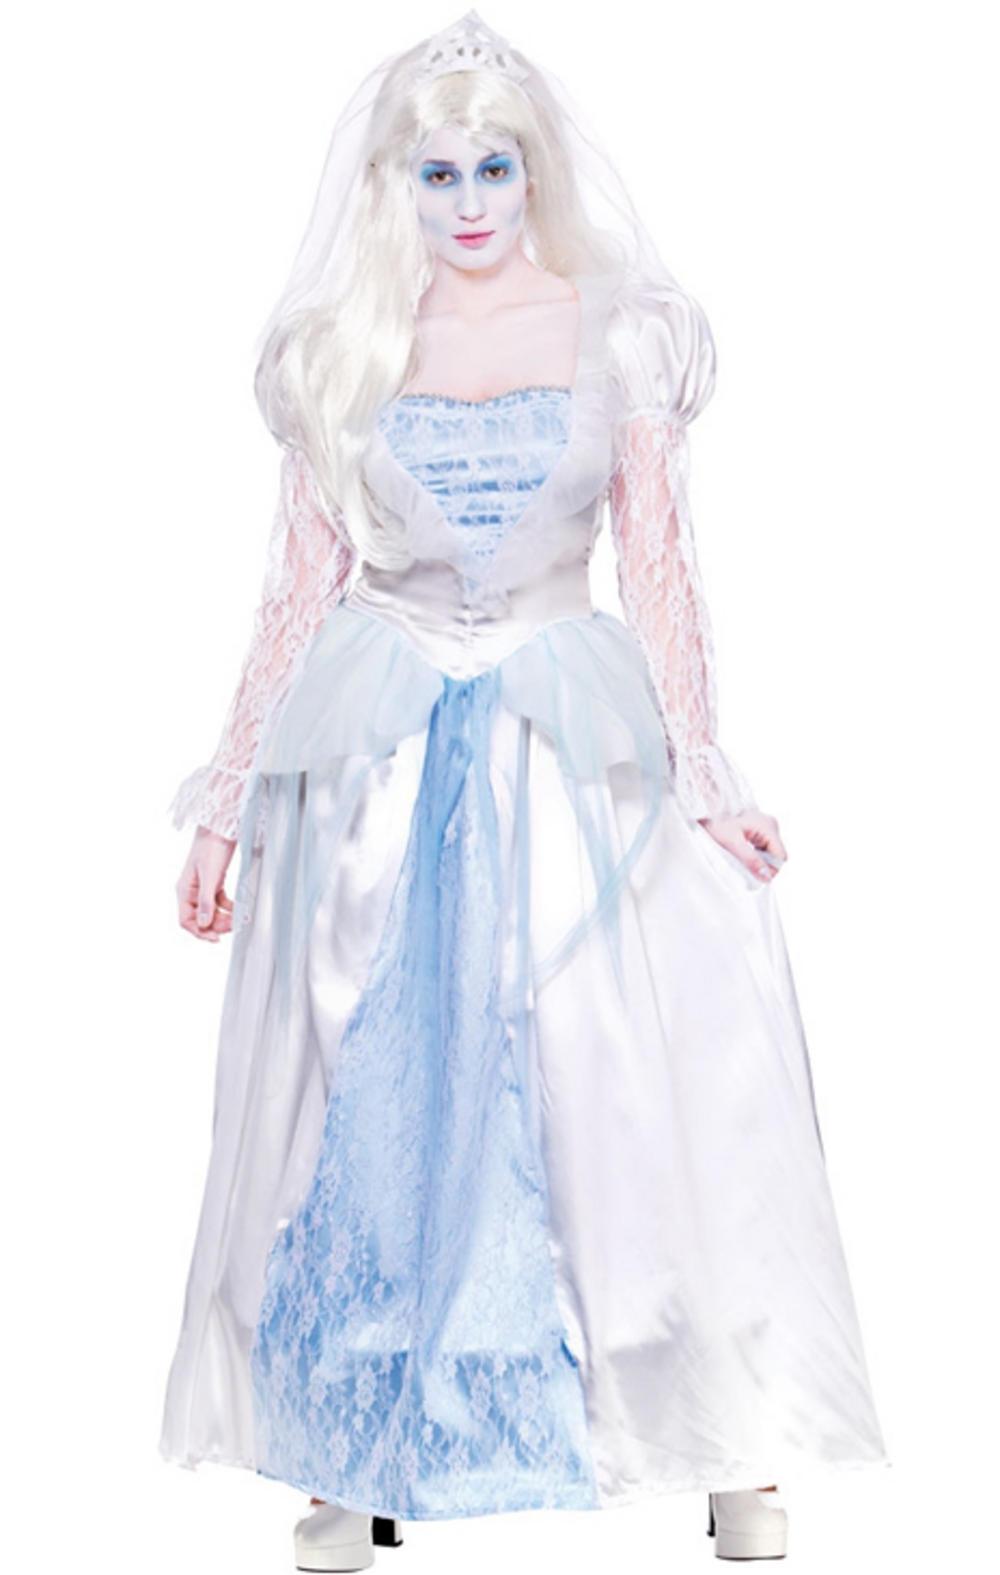 Ghost Bride Ladies Costume Ghost bride costume